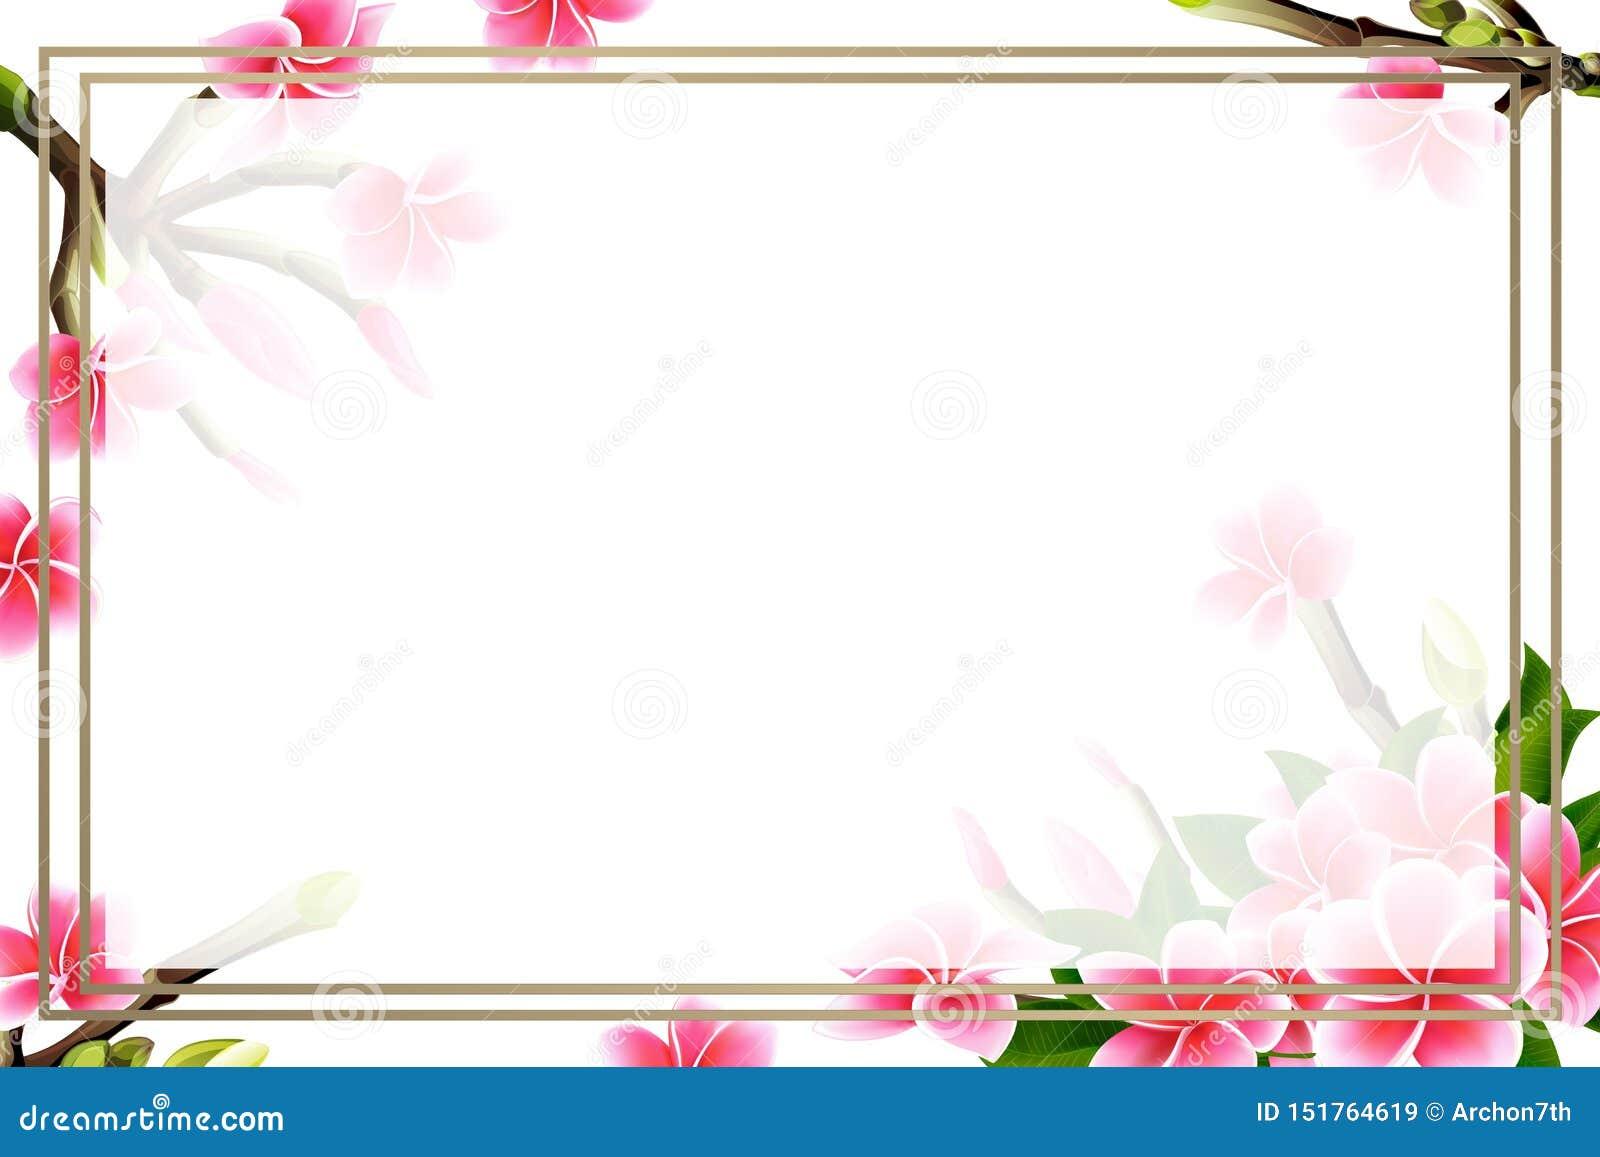 Wedding Invitation Card Floral Plumeria Frame And Lettering Postcard Template Stock Vector Illustration Of Bloom Florist 151764619